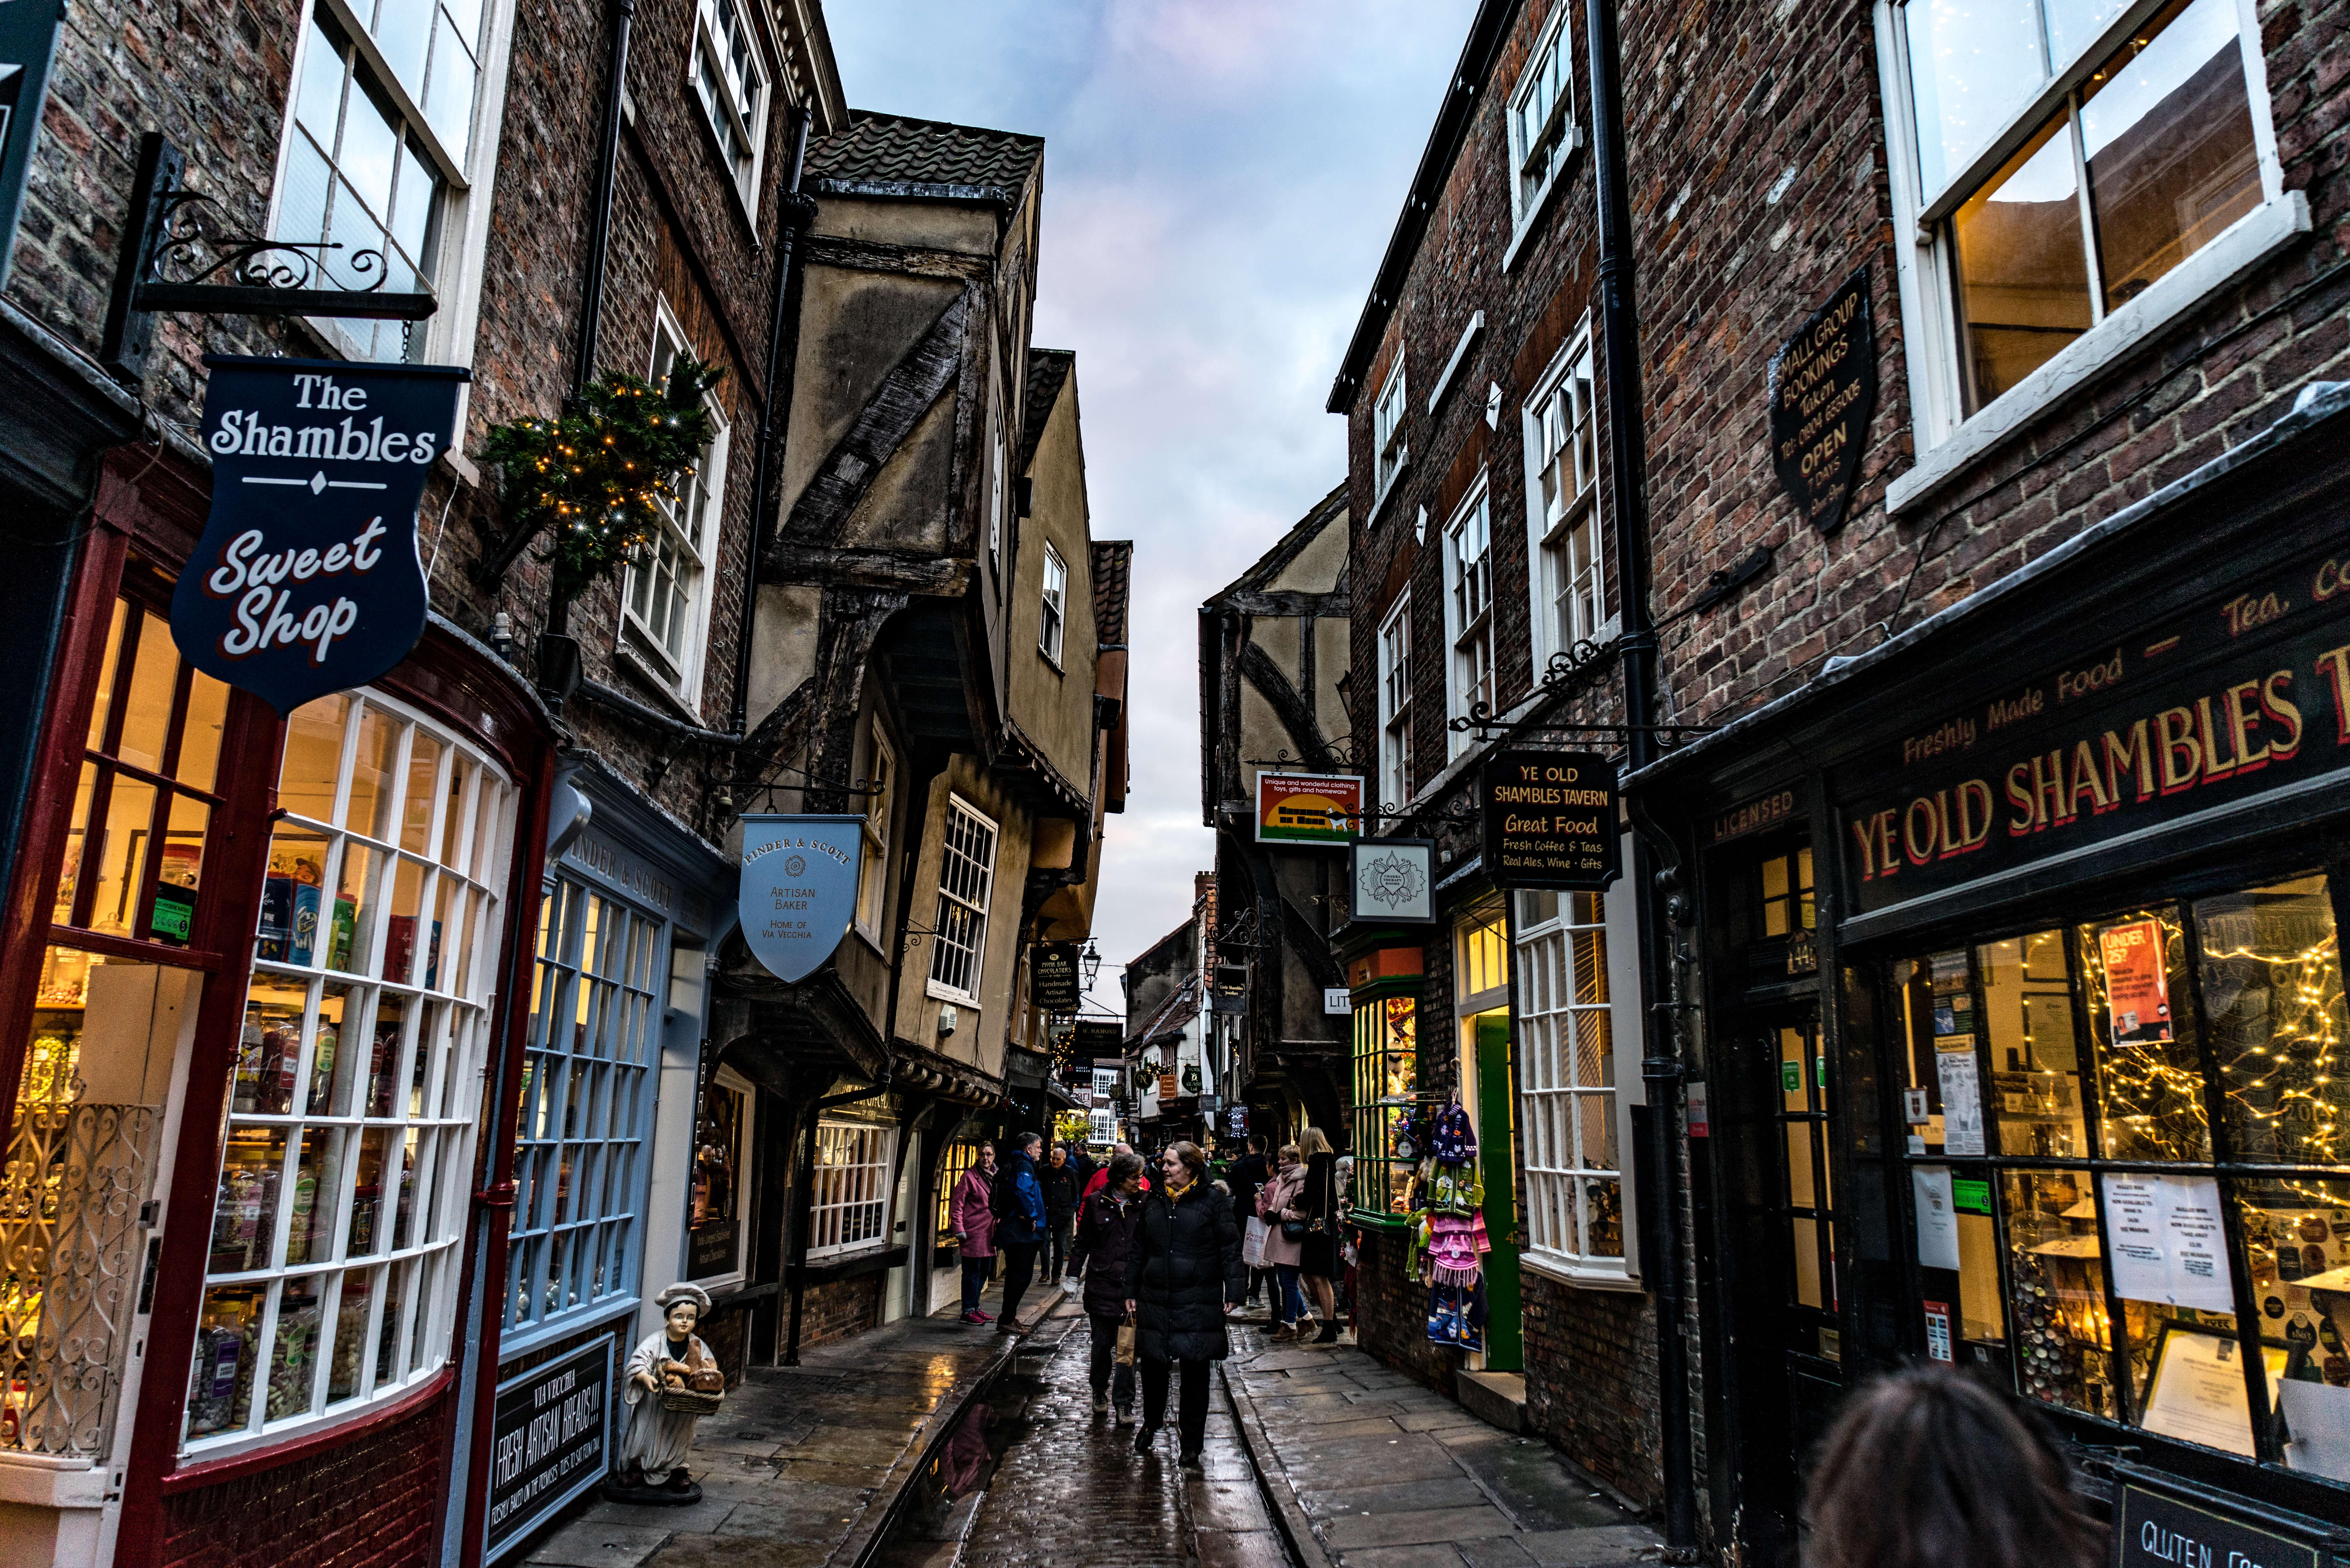 The shambles street, York